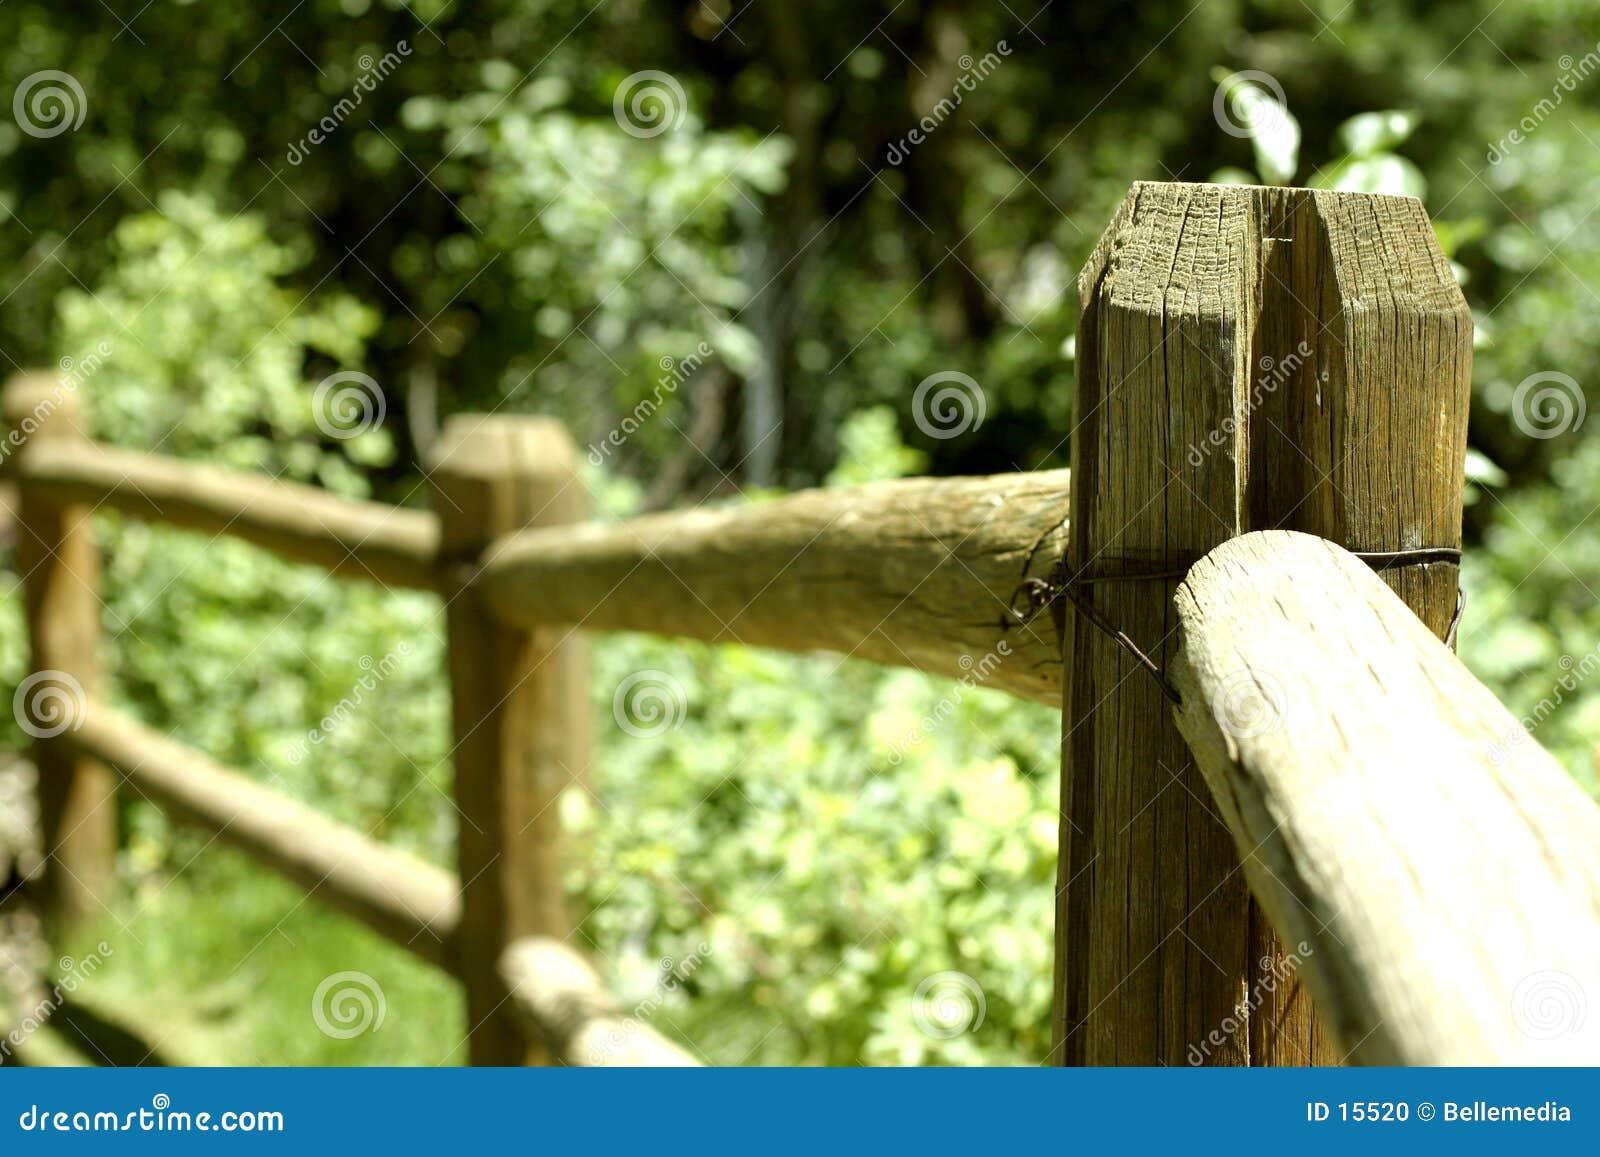 Fence farm